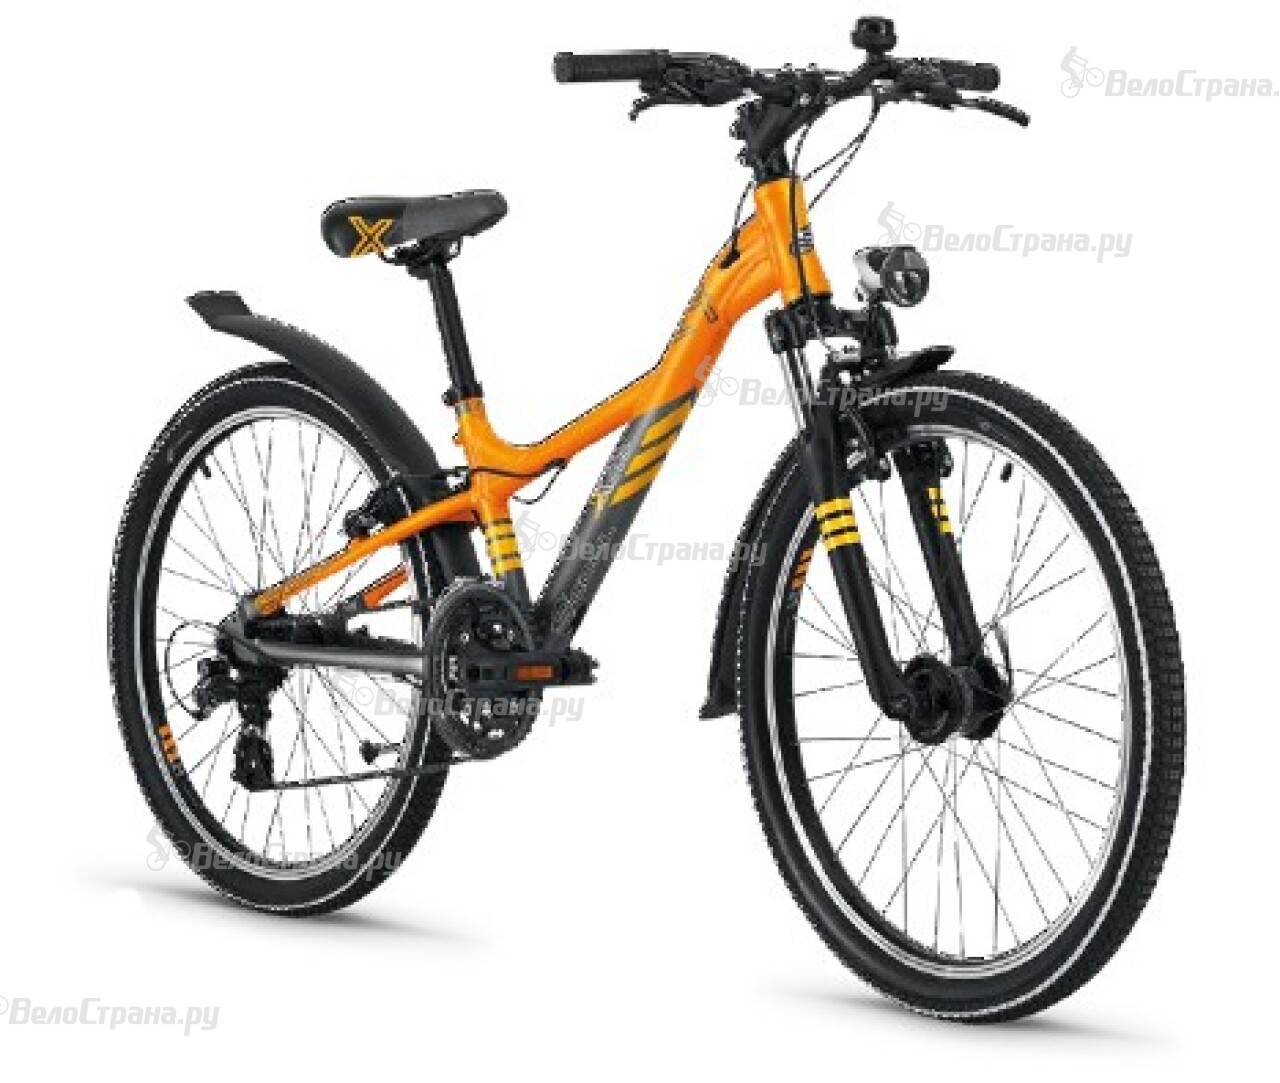 Велосипед Scool XX lite 24 24S (2014) цена